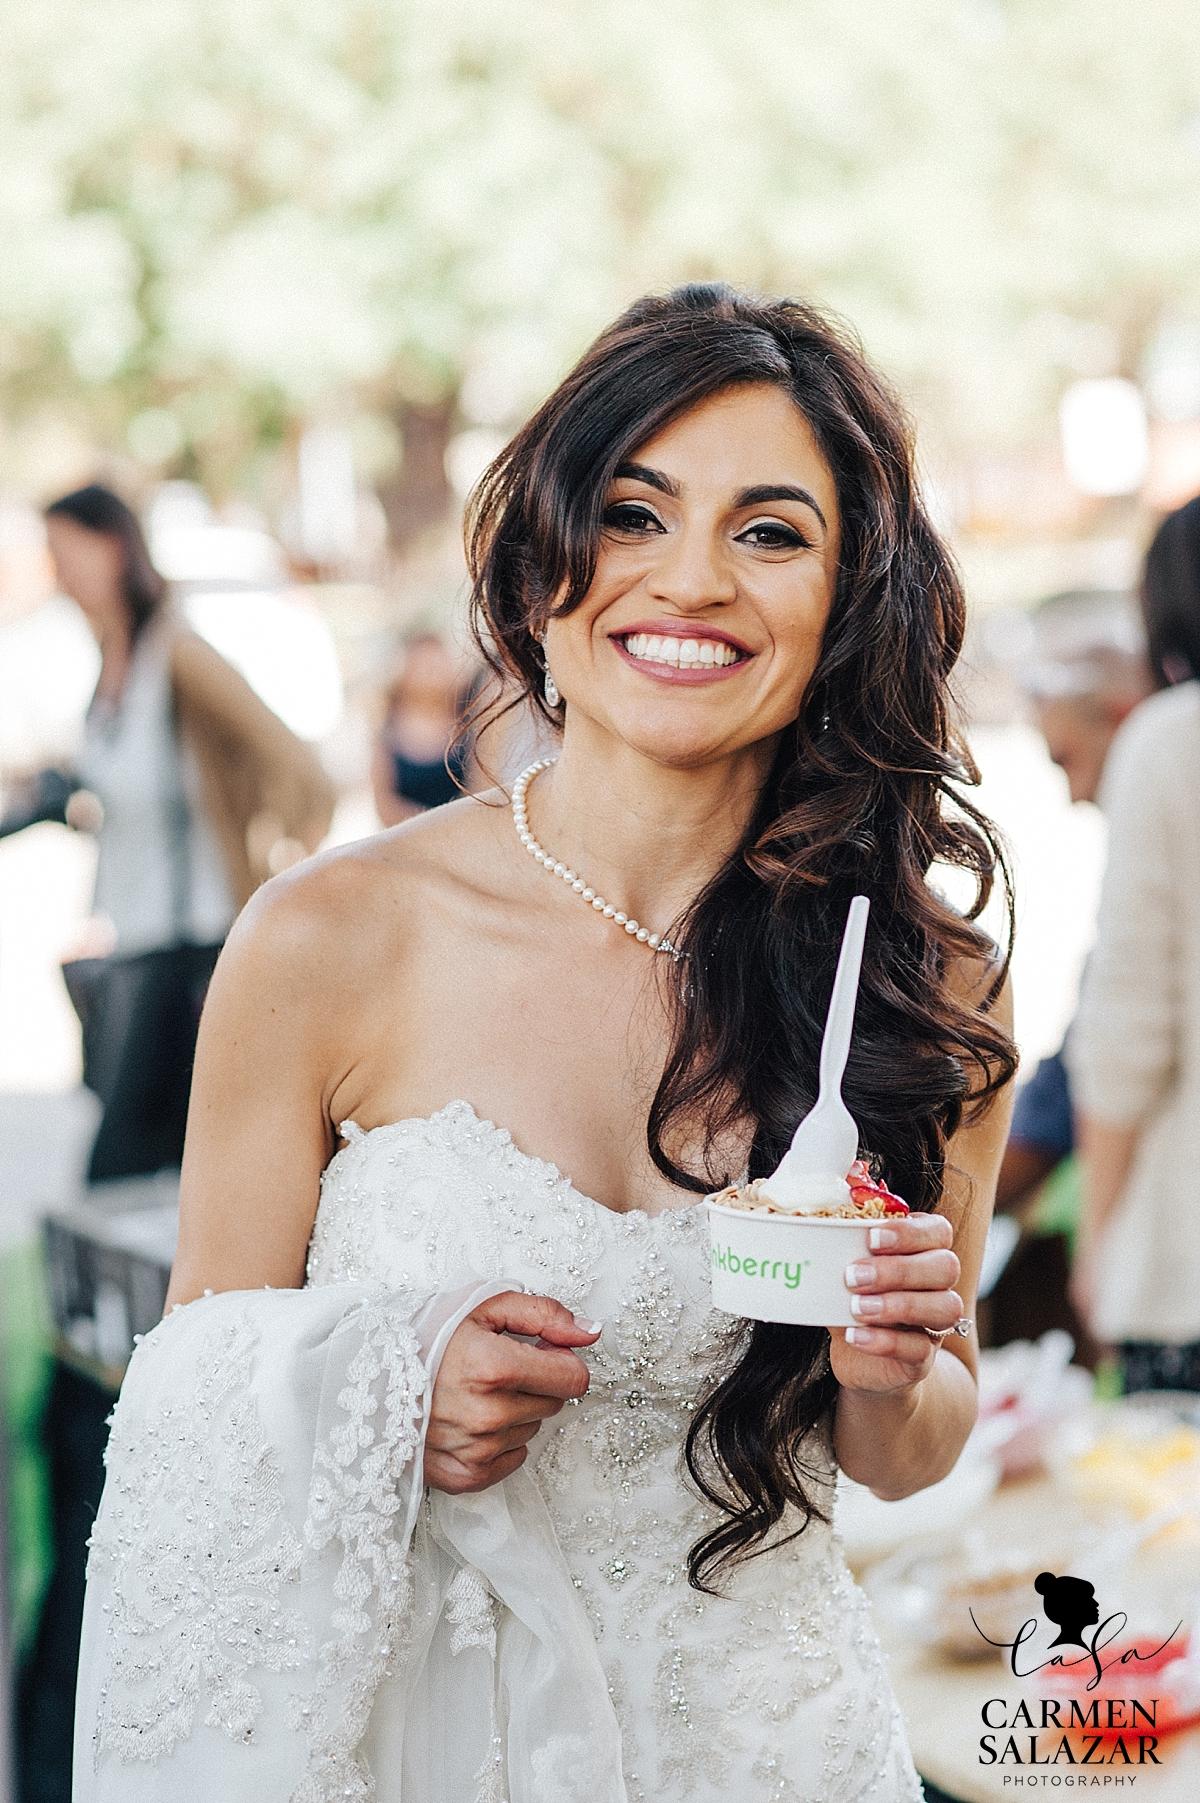 Smiling bride with Pinkberry yogurt - Carmen Salazar